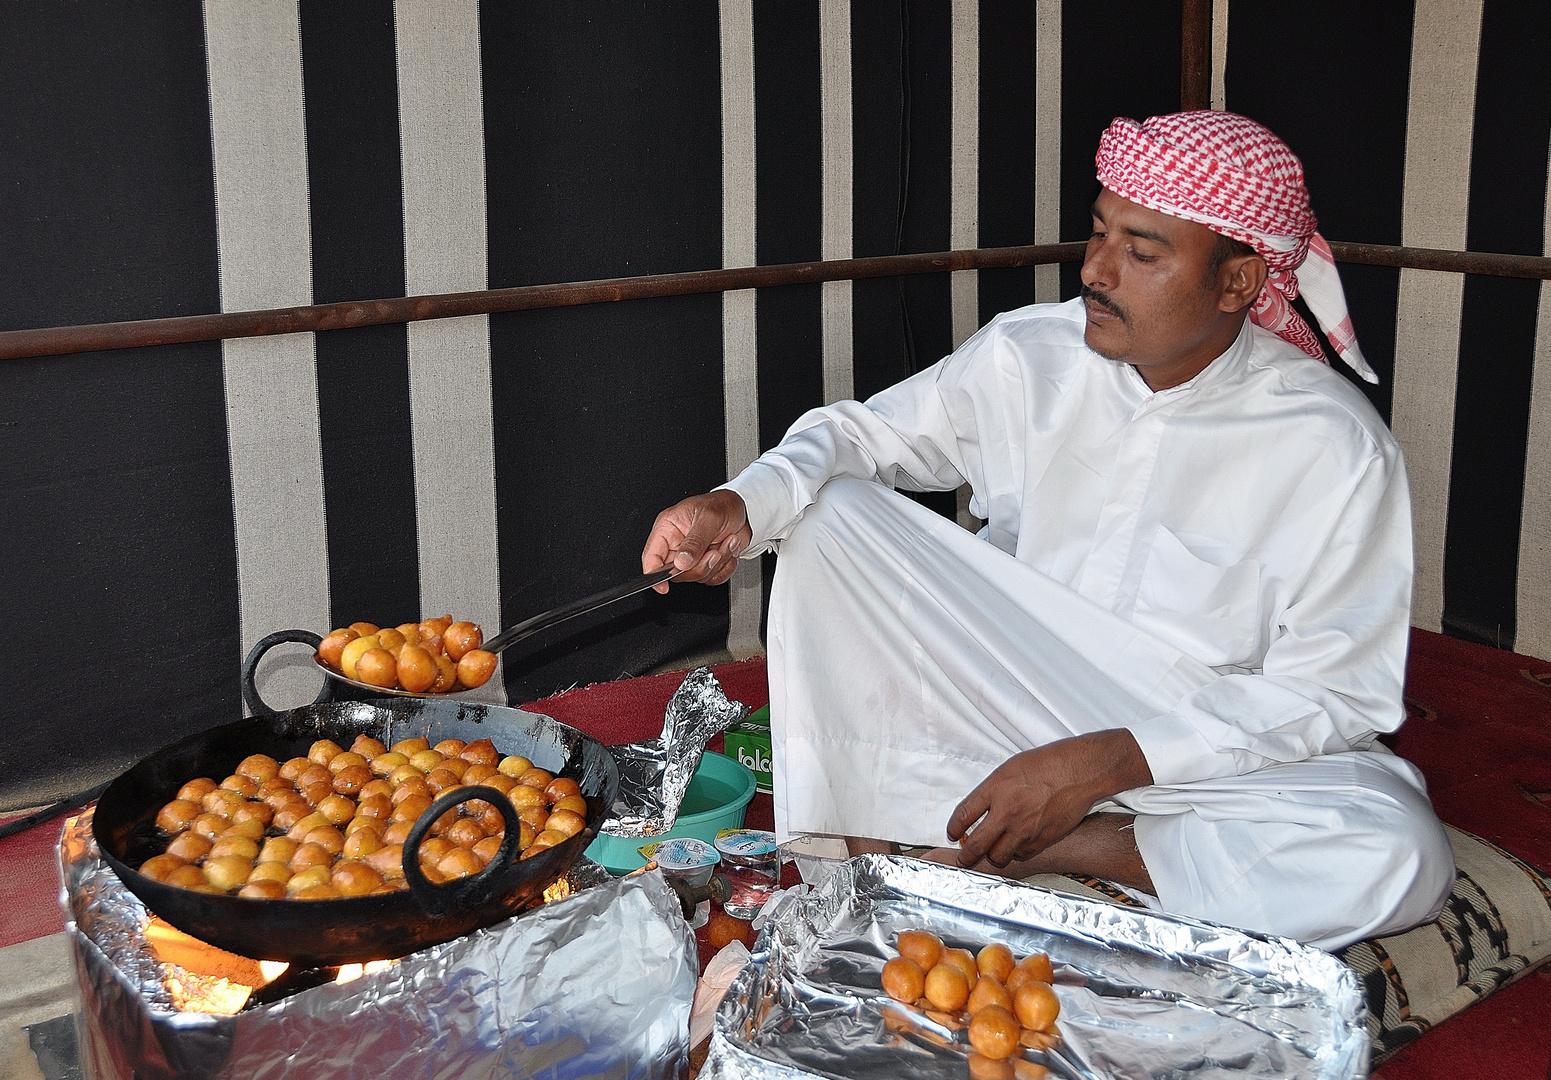 arabische kueche loqmat foto bild asia middle east united arab emirates bilder auf. Black Bedroom Furniture Sets. Home Design Ideas